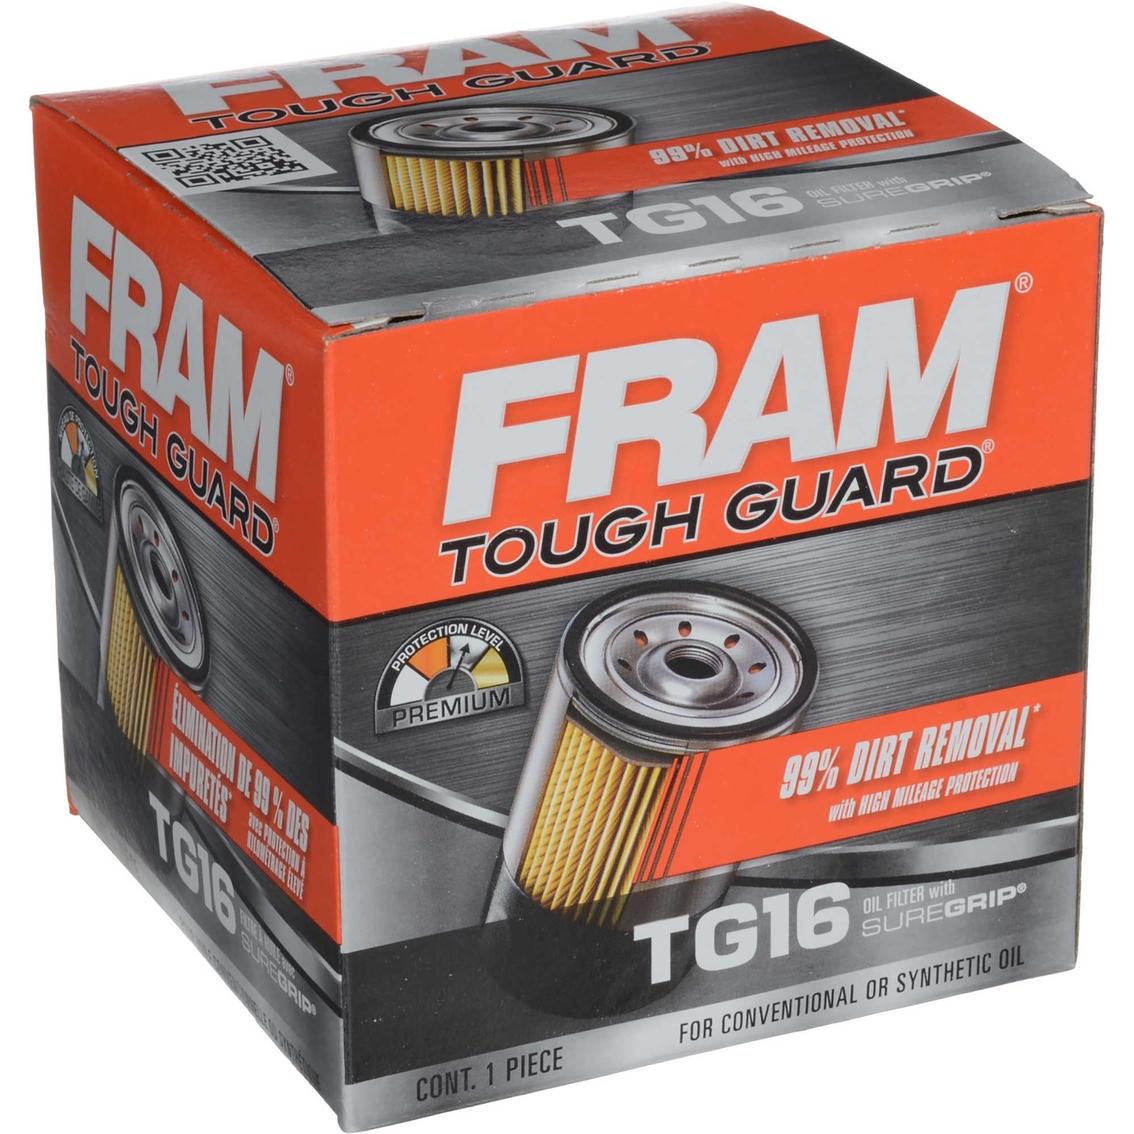 Fram Tough Guard Spin On Oil Filter Tg